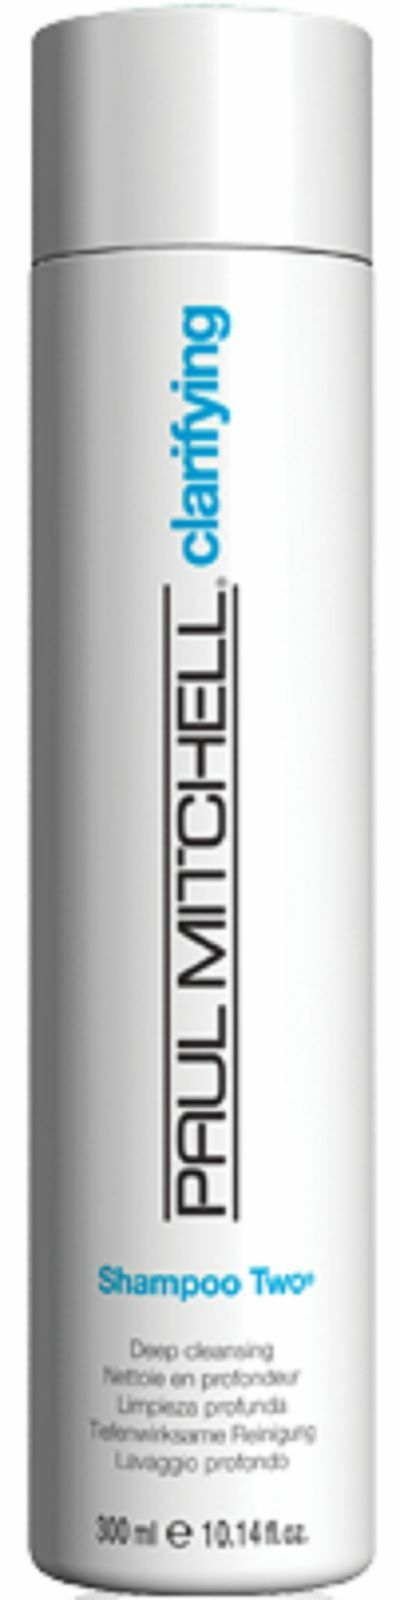 PAUL MITCHELL SHAMPOO TWO 300 ML